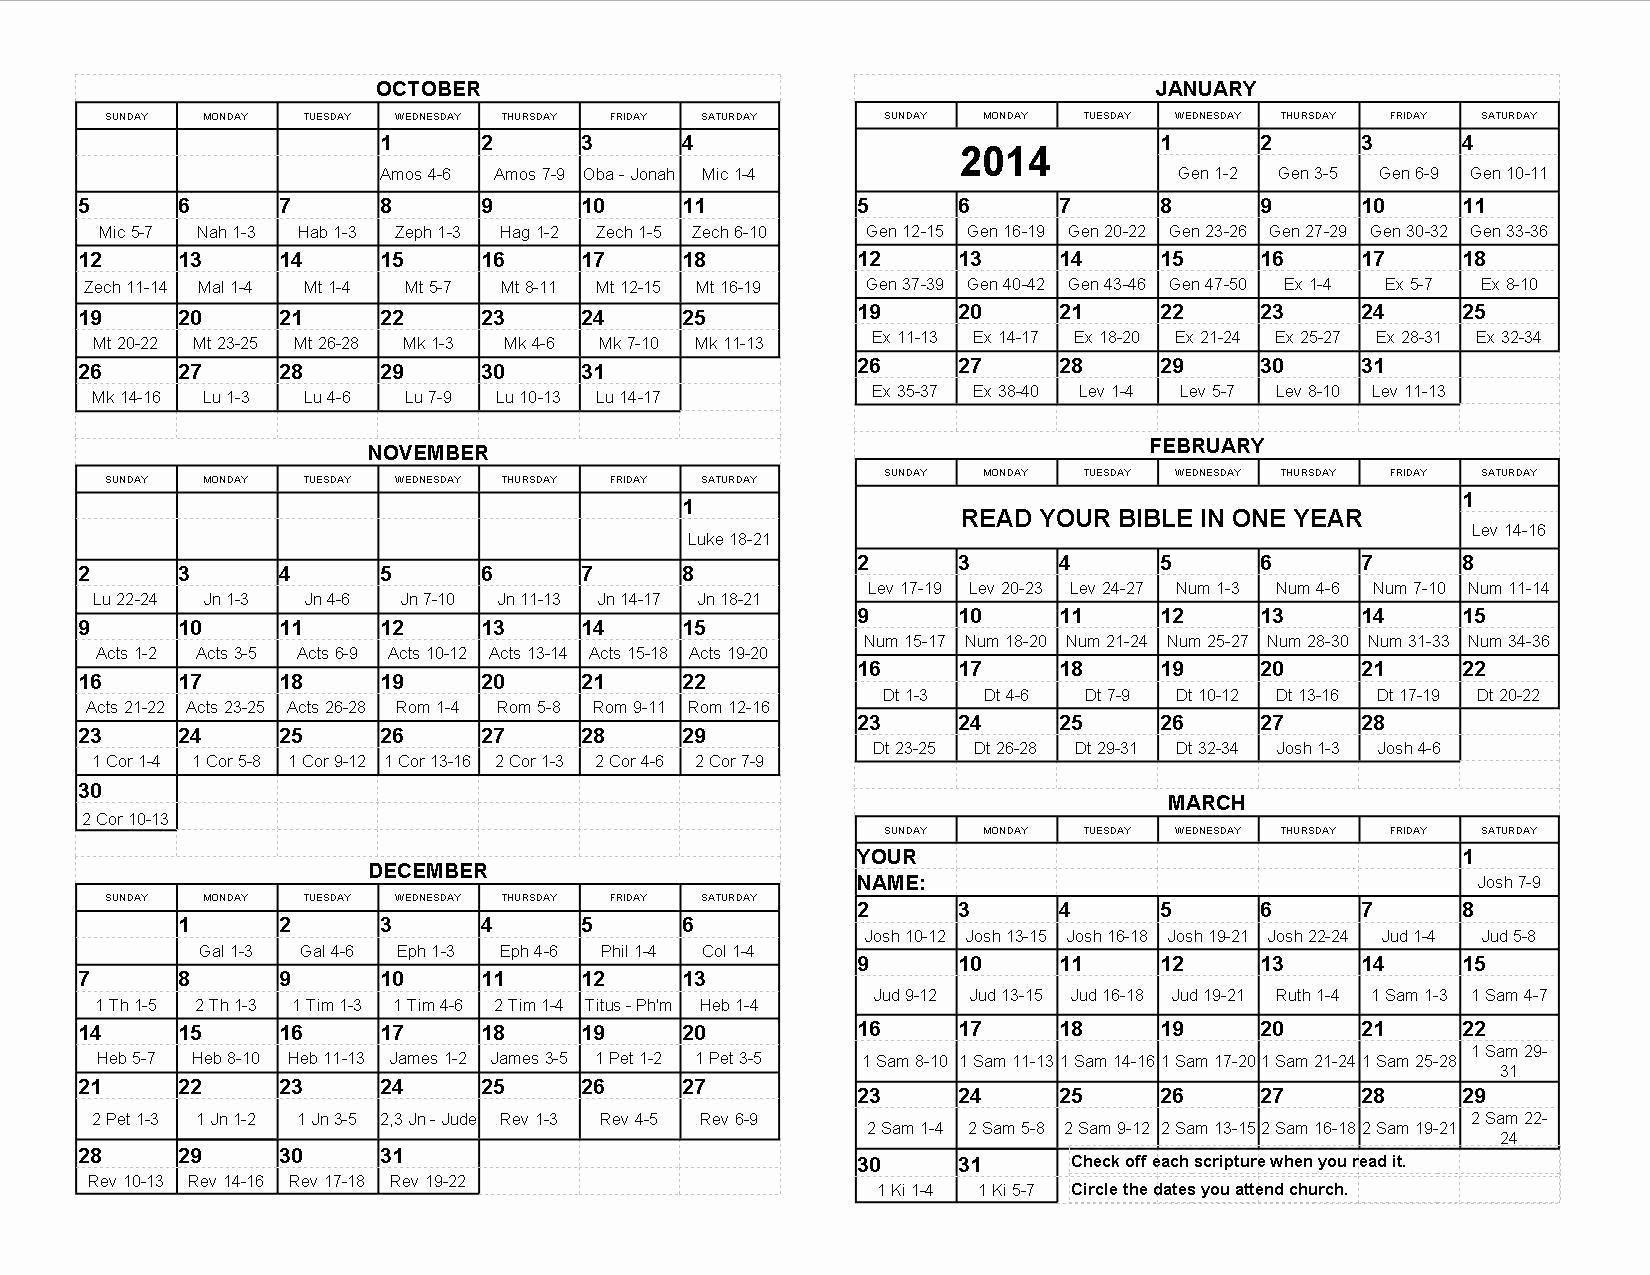 Fresh 59 sample read the bible in a year calendar